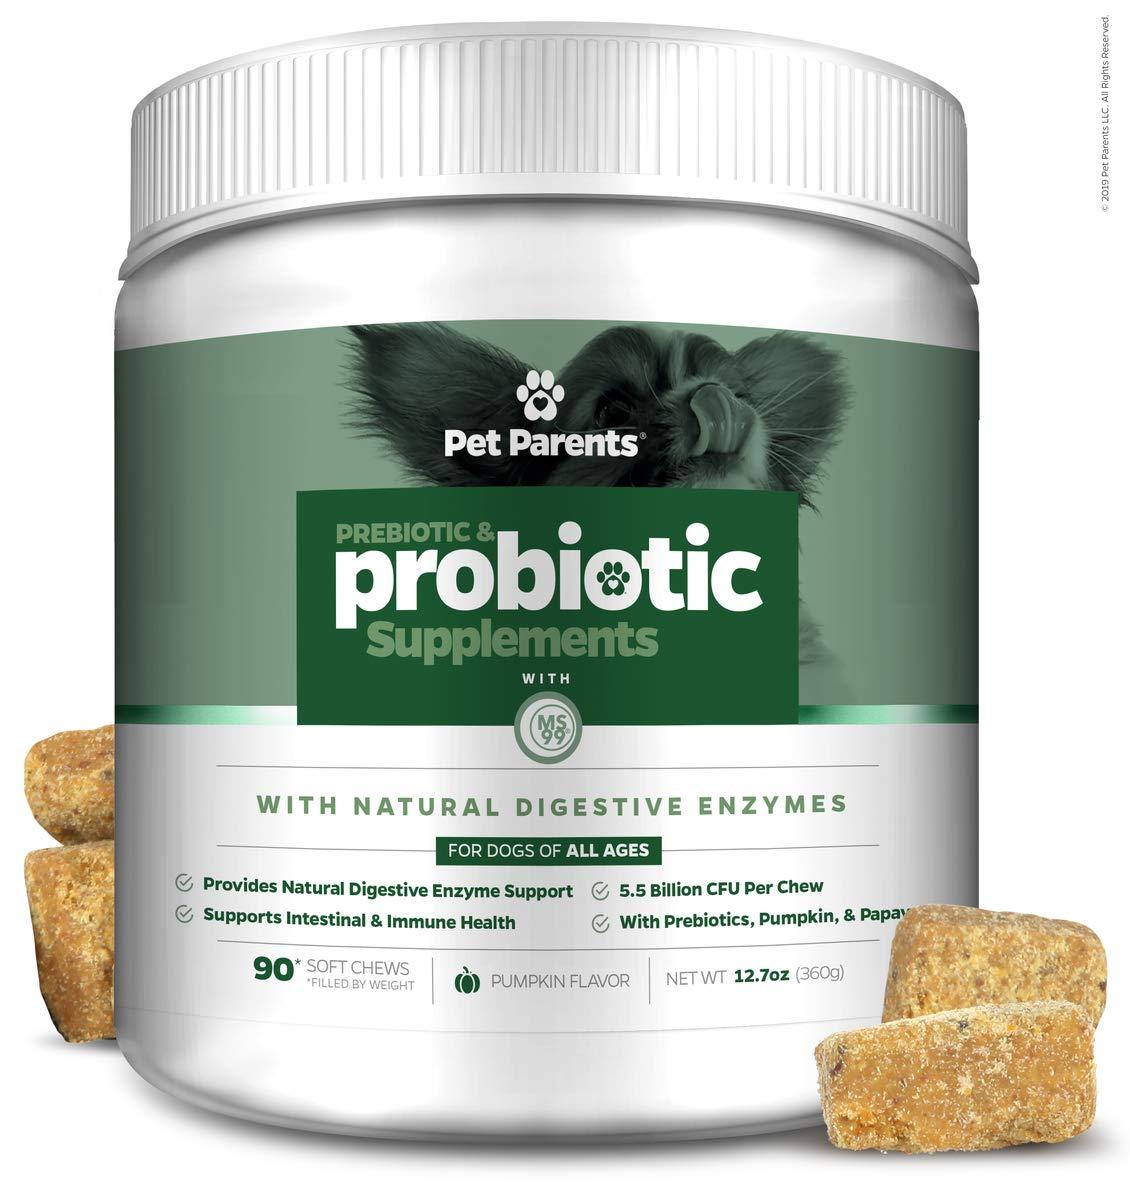 Pet Parents USA Pre & Probiotics for Dogs 4g 90c - 5.5B CFUs/Chew + Dog Enzymes + Pumpkin for Dogs, Papaya & Canine Probiotics - Dog Upset Stomach Relief, Anti Diarrhea for Dogs, Dog Probiotics by Pet Parents